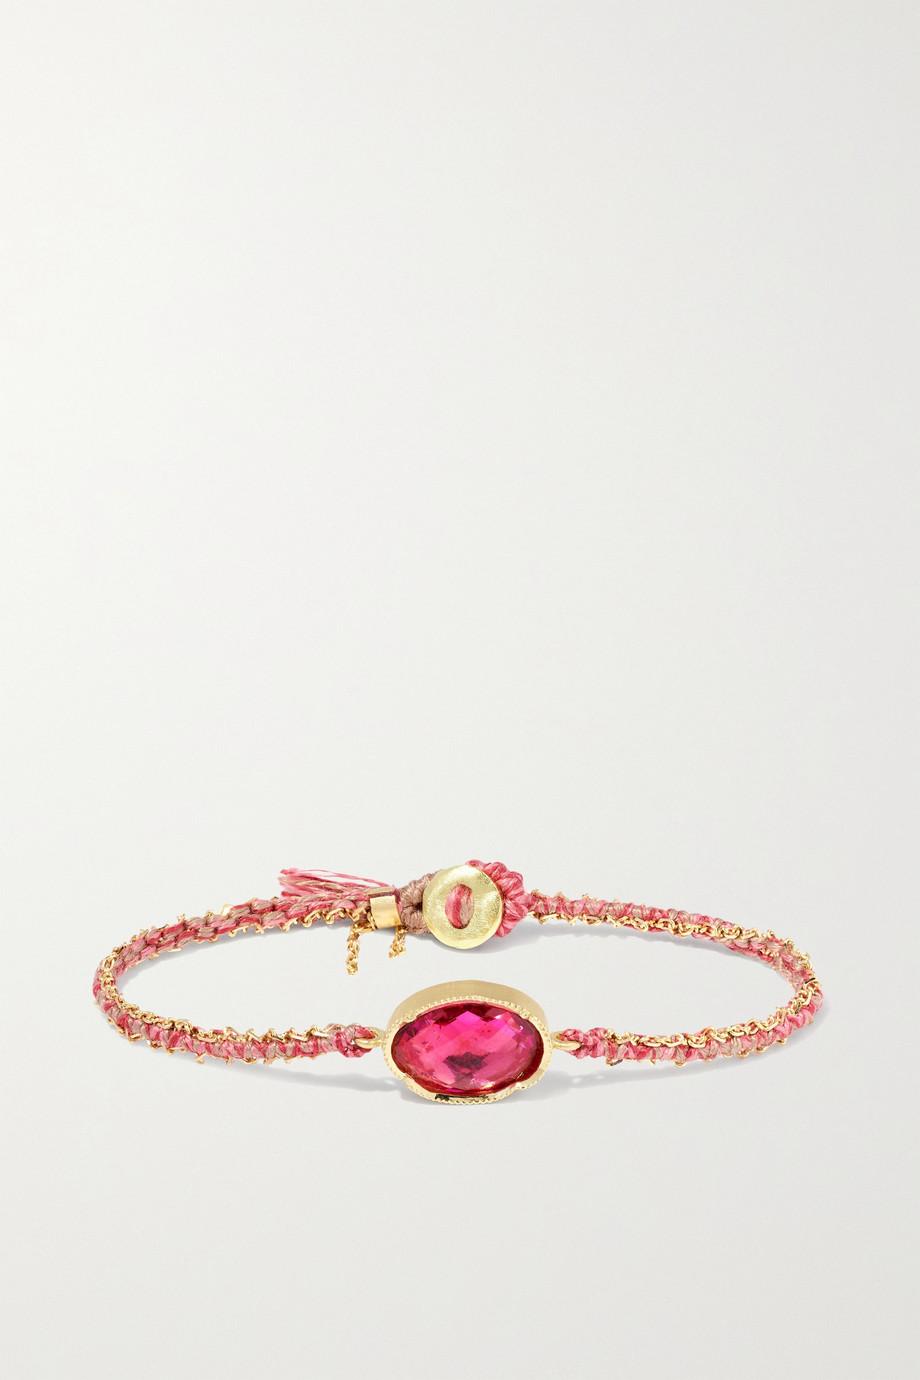 Brooke Gregson Orbit 18-karat gold, silk and tourmaline bracelet